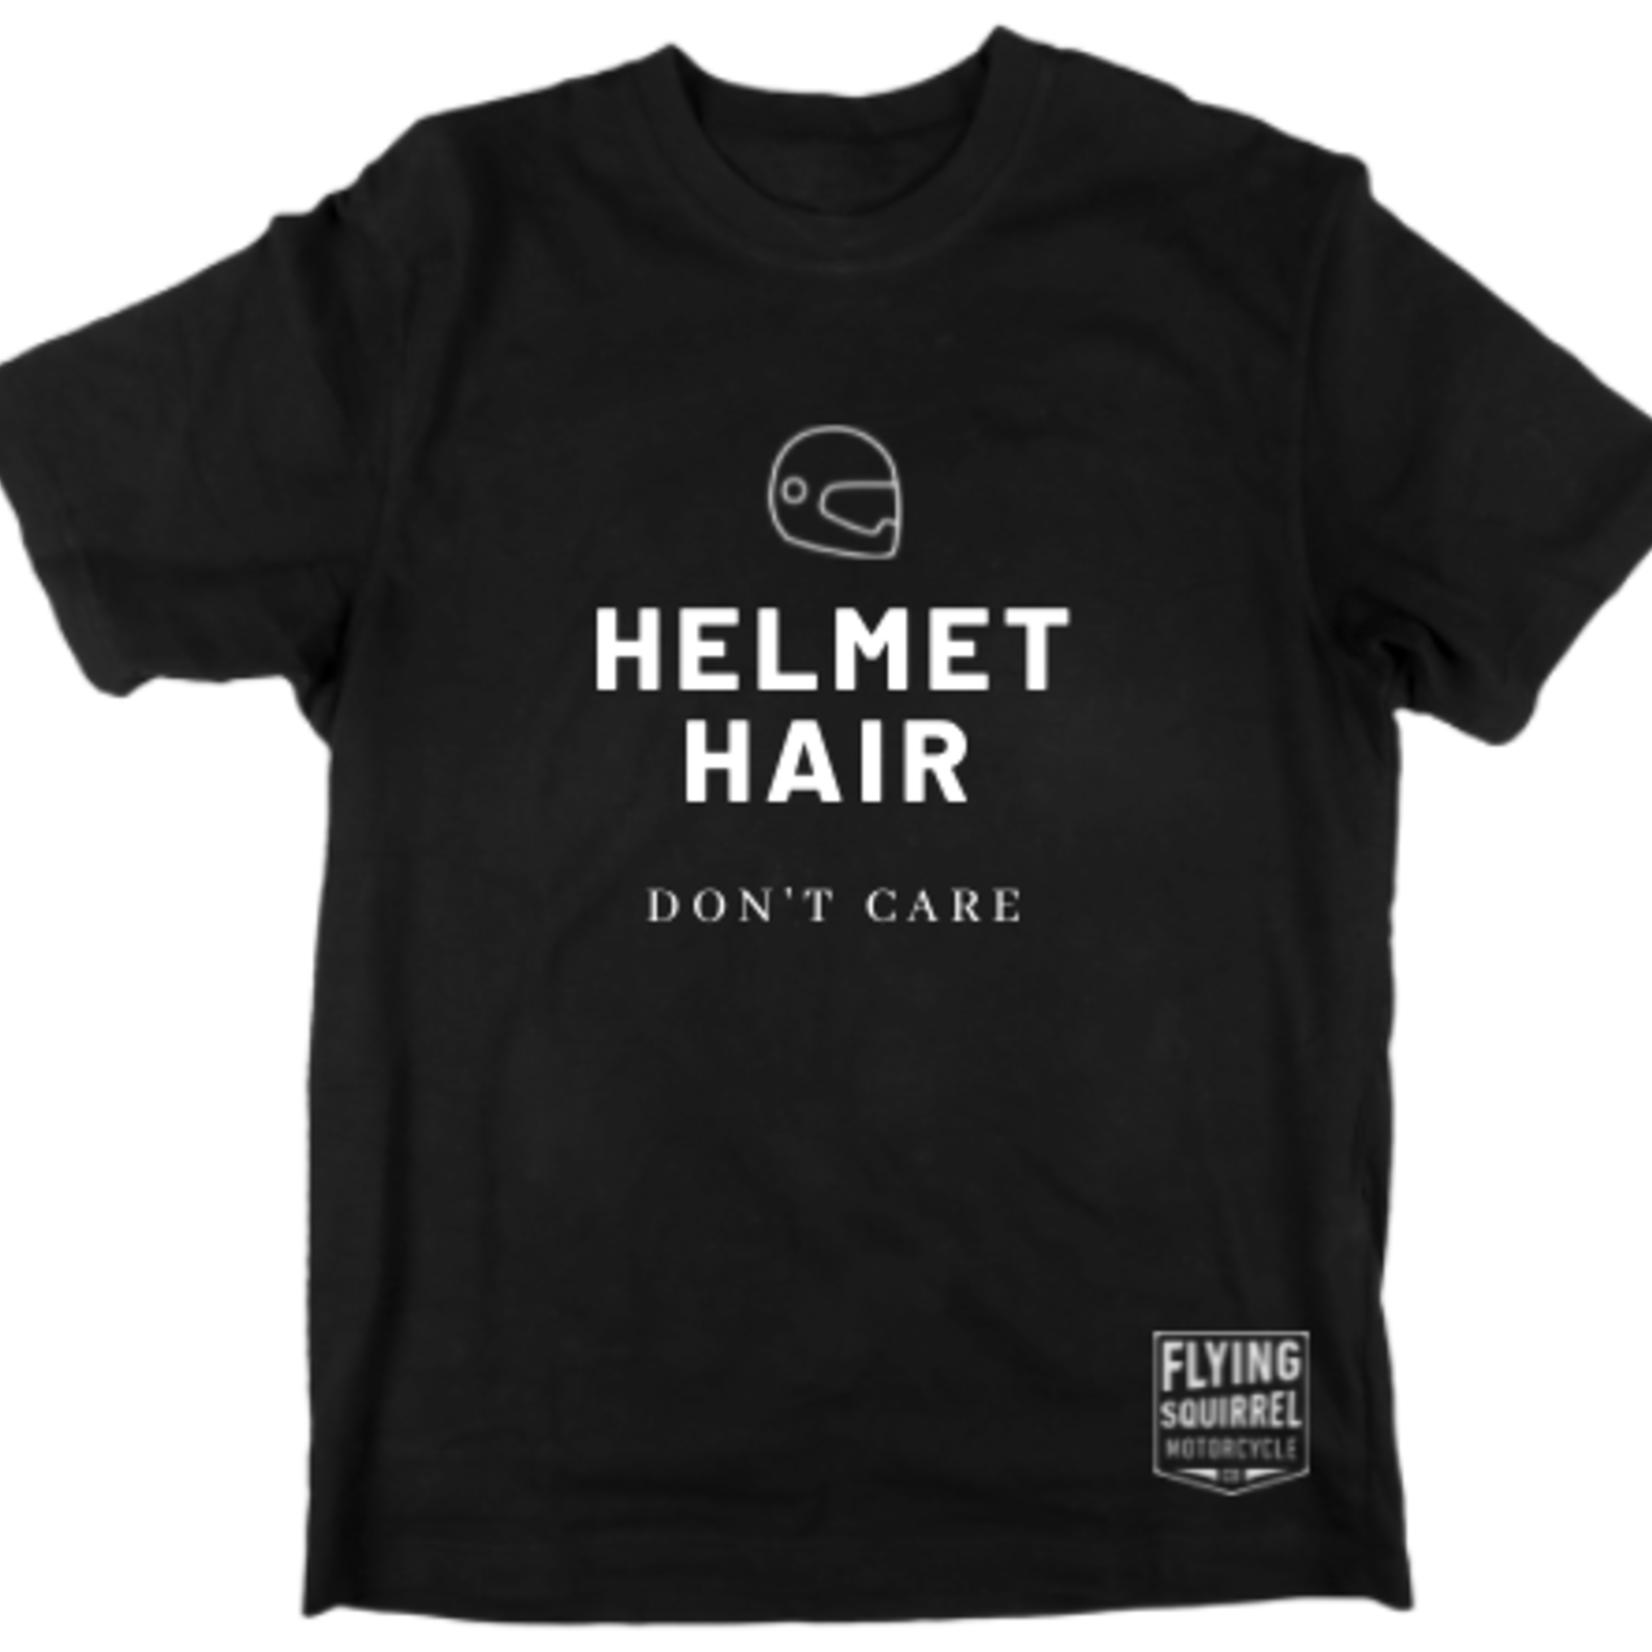 FSM Helmet Hair T-shirt - Black